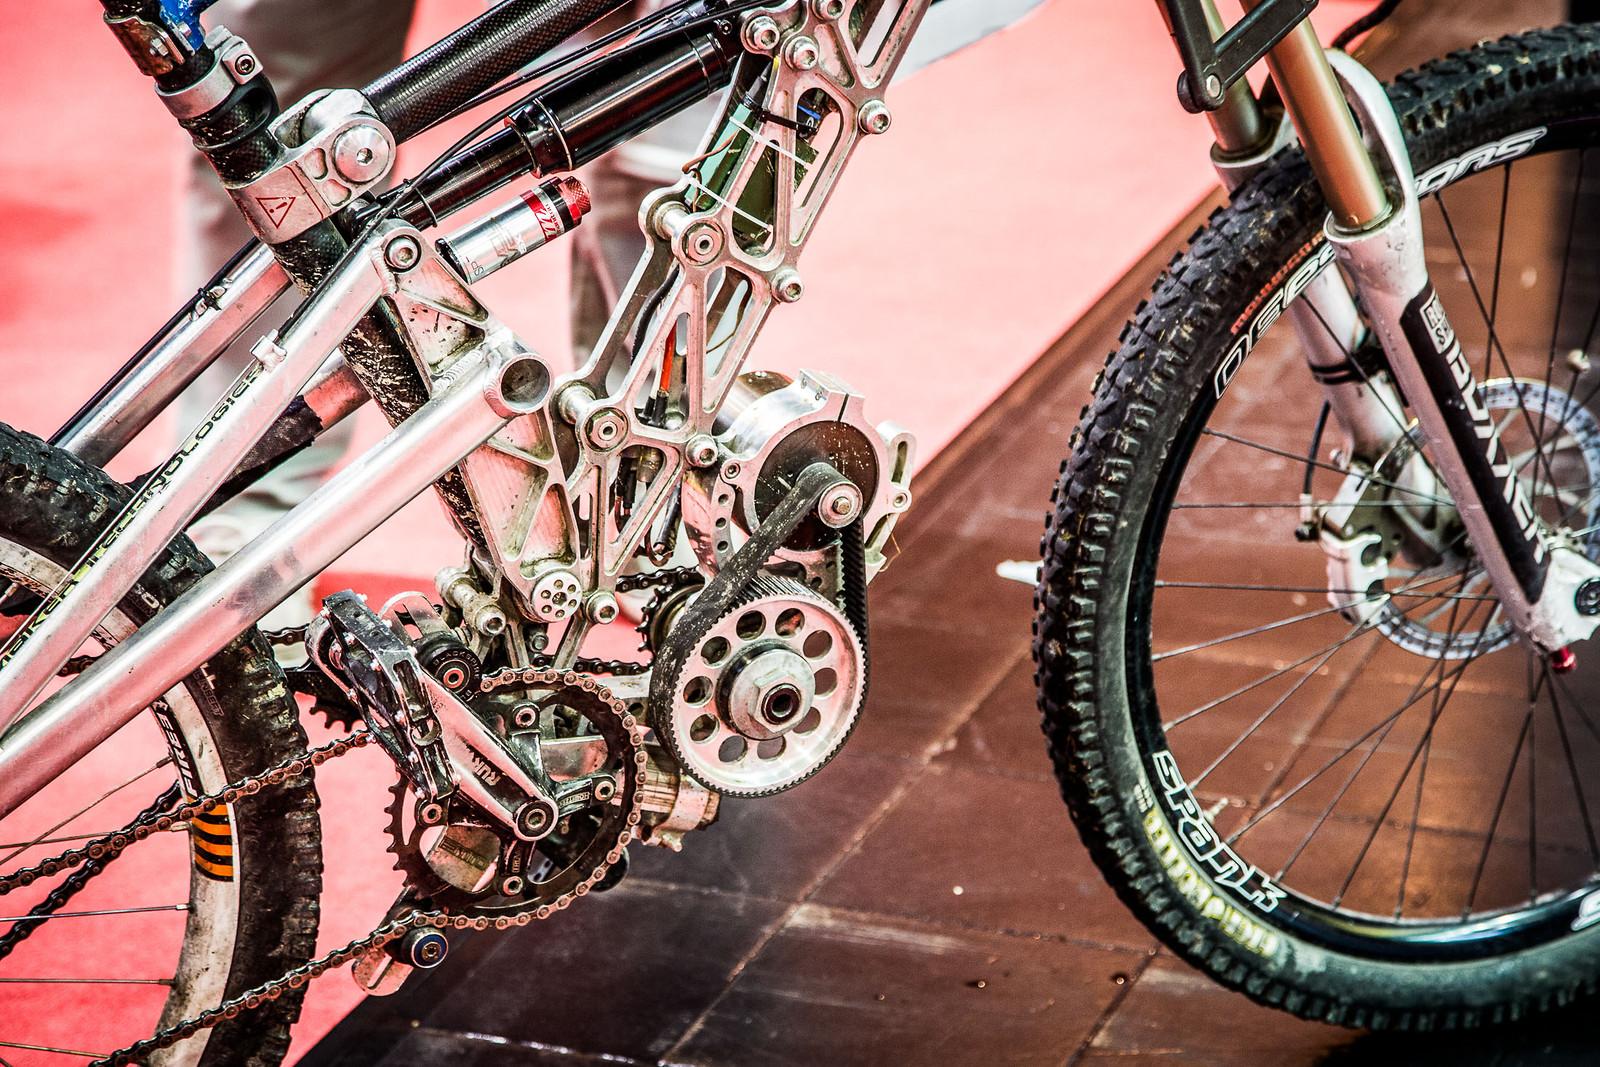 Heavy Metal - iceman2058 - Mountain Biking Pictures - Vital MTB